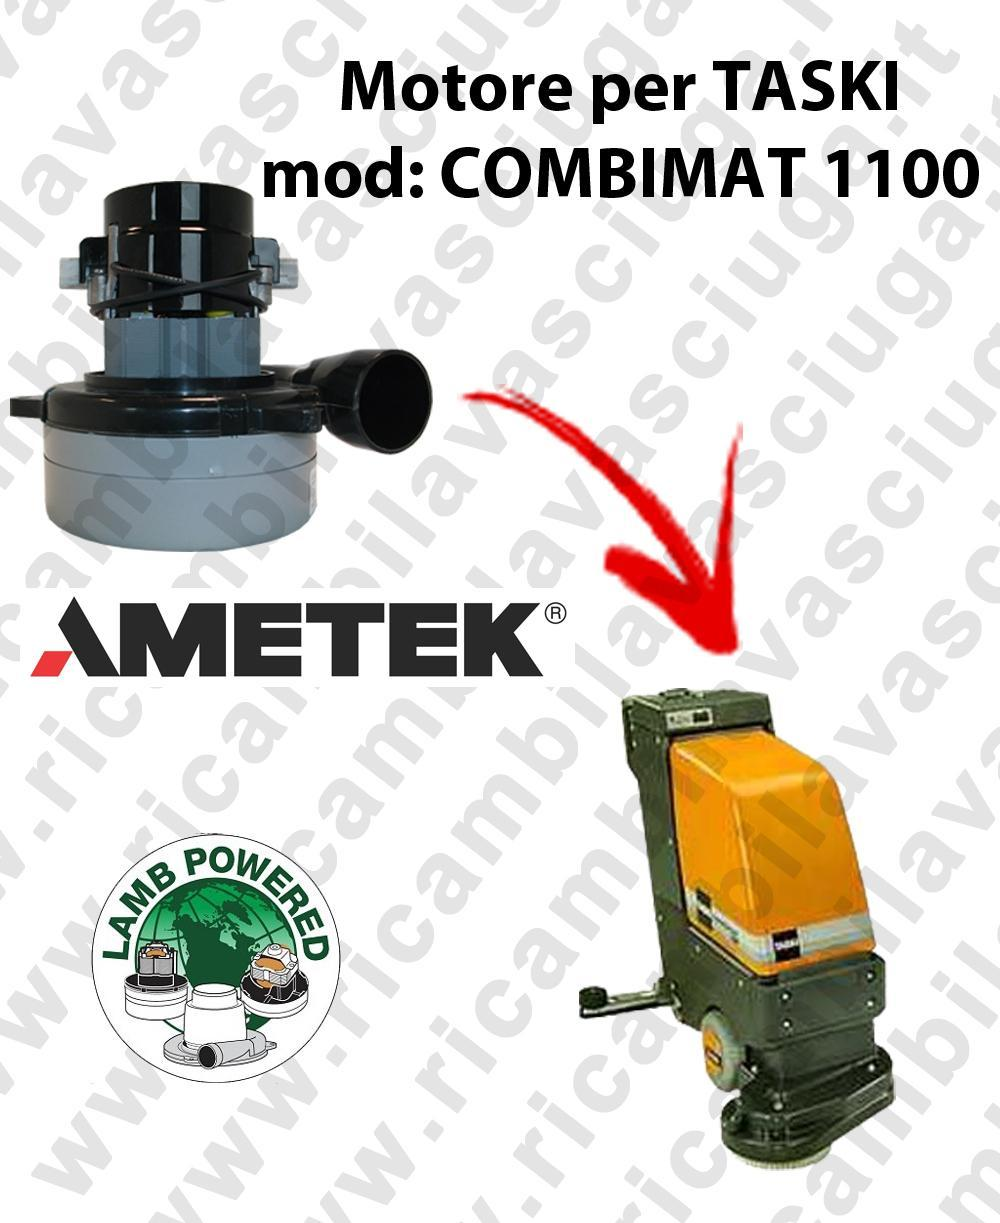 COMBIMAT 1100 Motore de aspiración LAMB AMETEK para fregadora TASKI